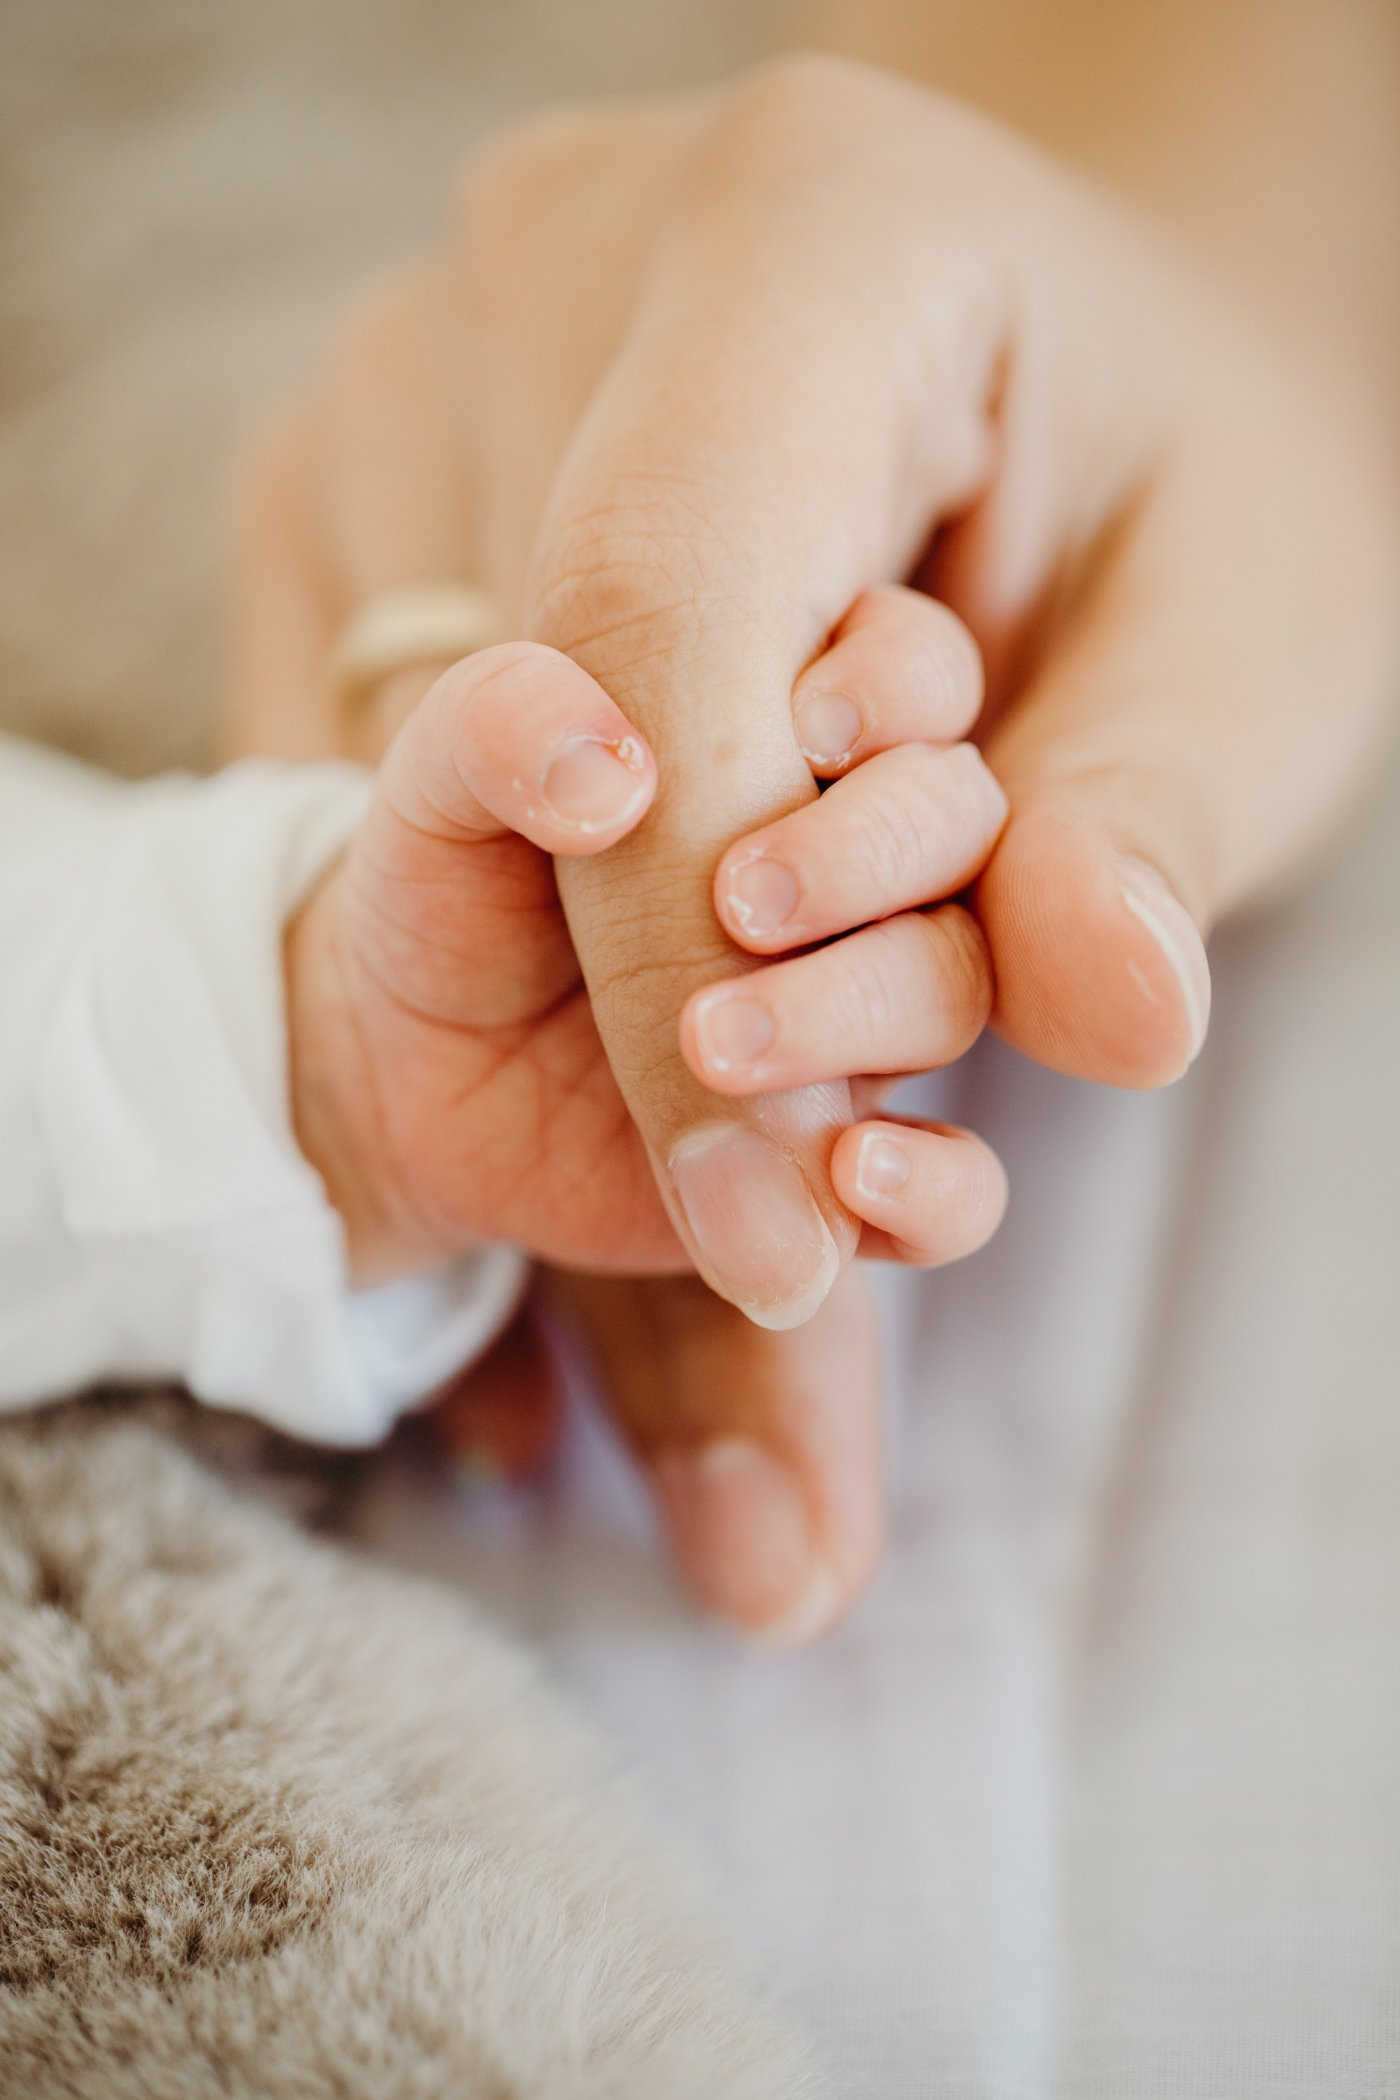 Babyfotos-Schwangerschaft-Paarfotos-Homeshooting-Newborn-Speyer-Landau-Karlsruhe